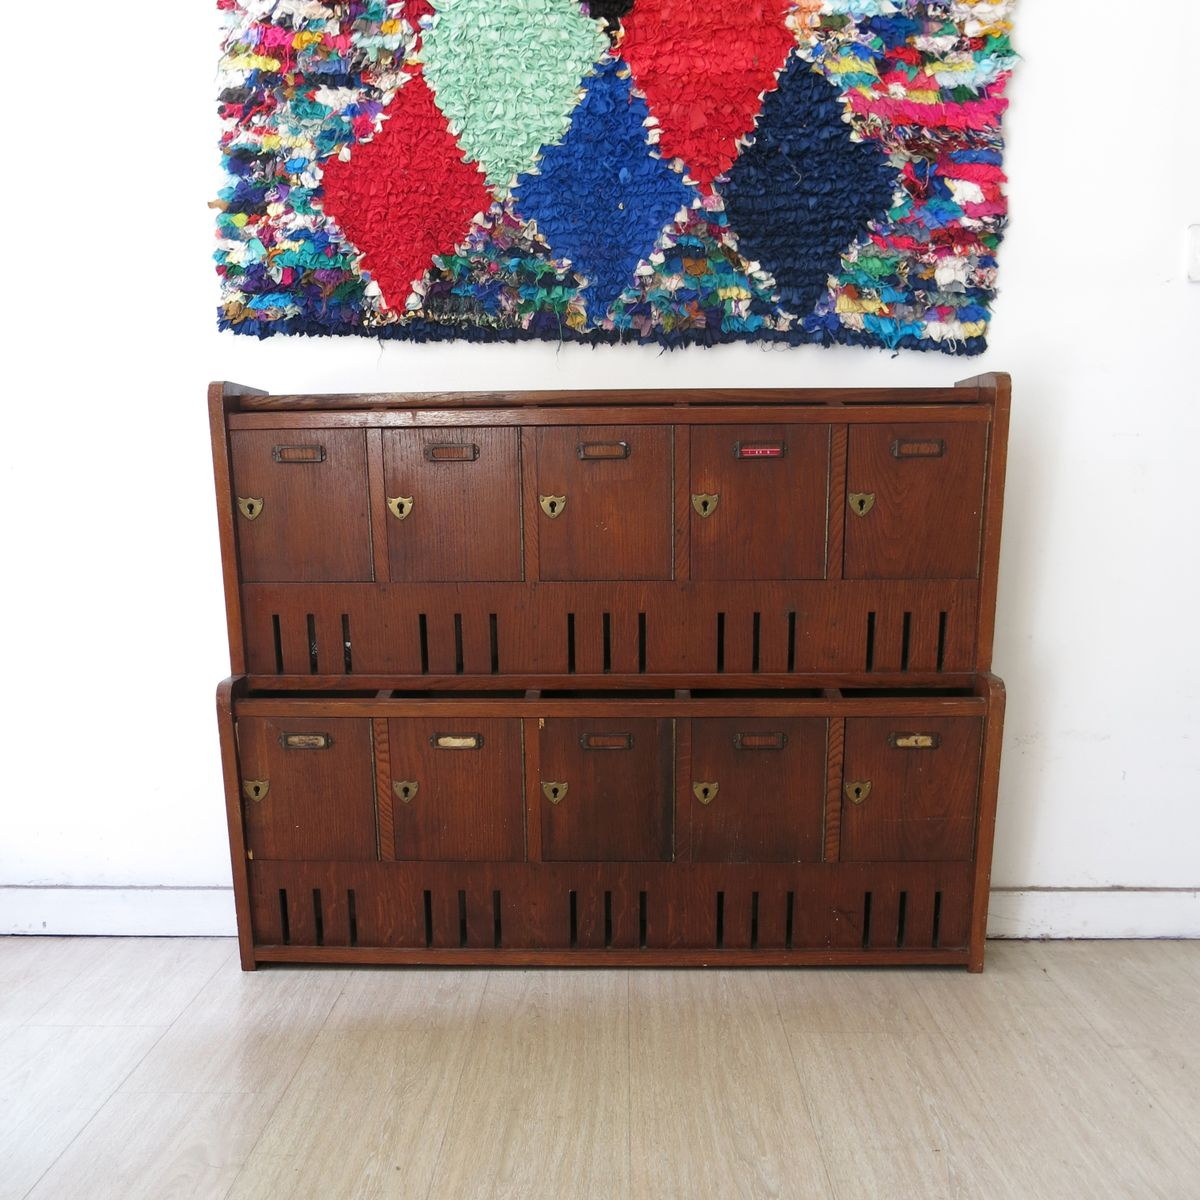 bo te aux lettres vintage angleterre en vente sur pamono. Black Bedroom Furniture Sets. Home Design Ideas